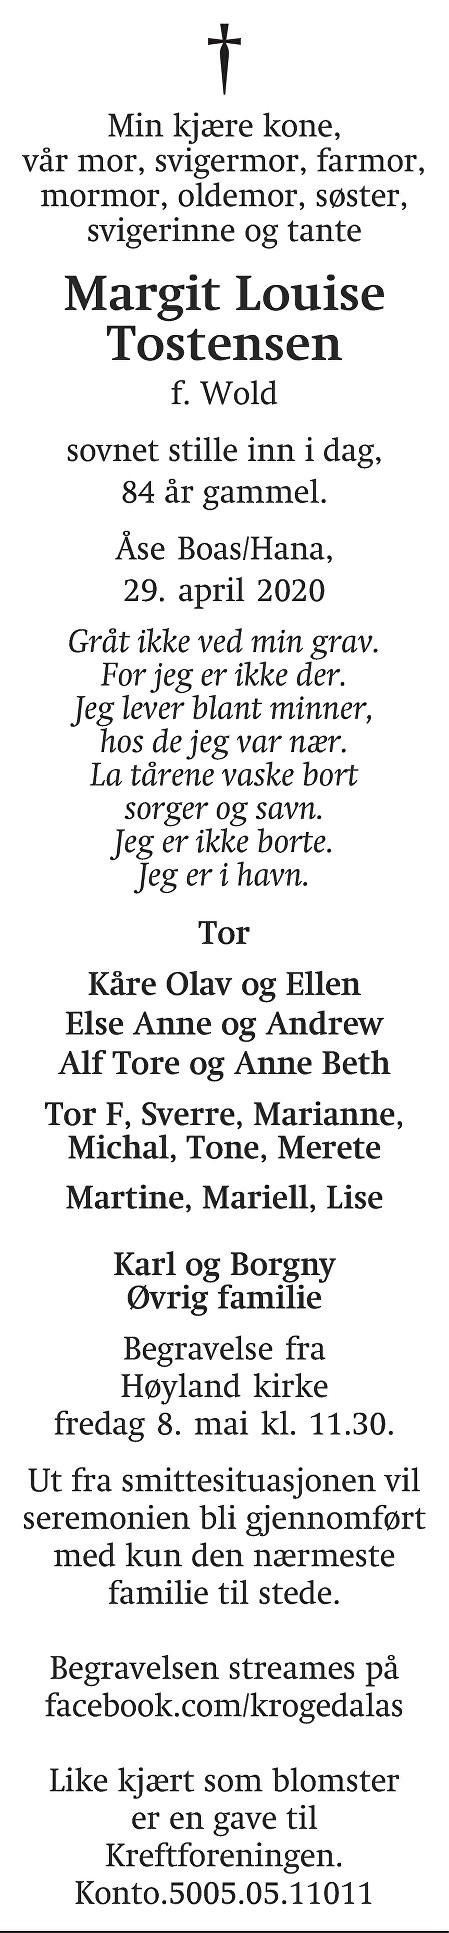 Margit Louise Tostensen Dødsannonse